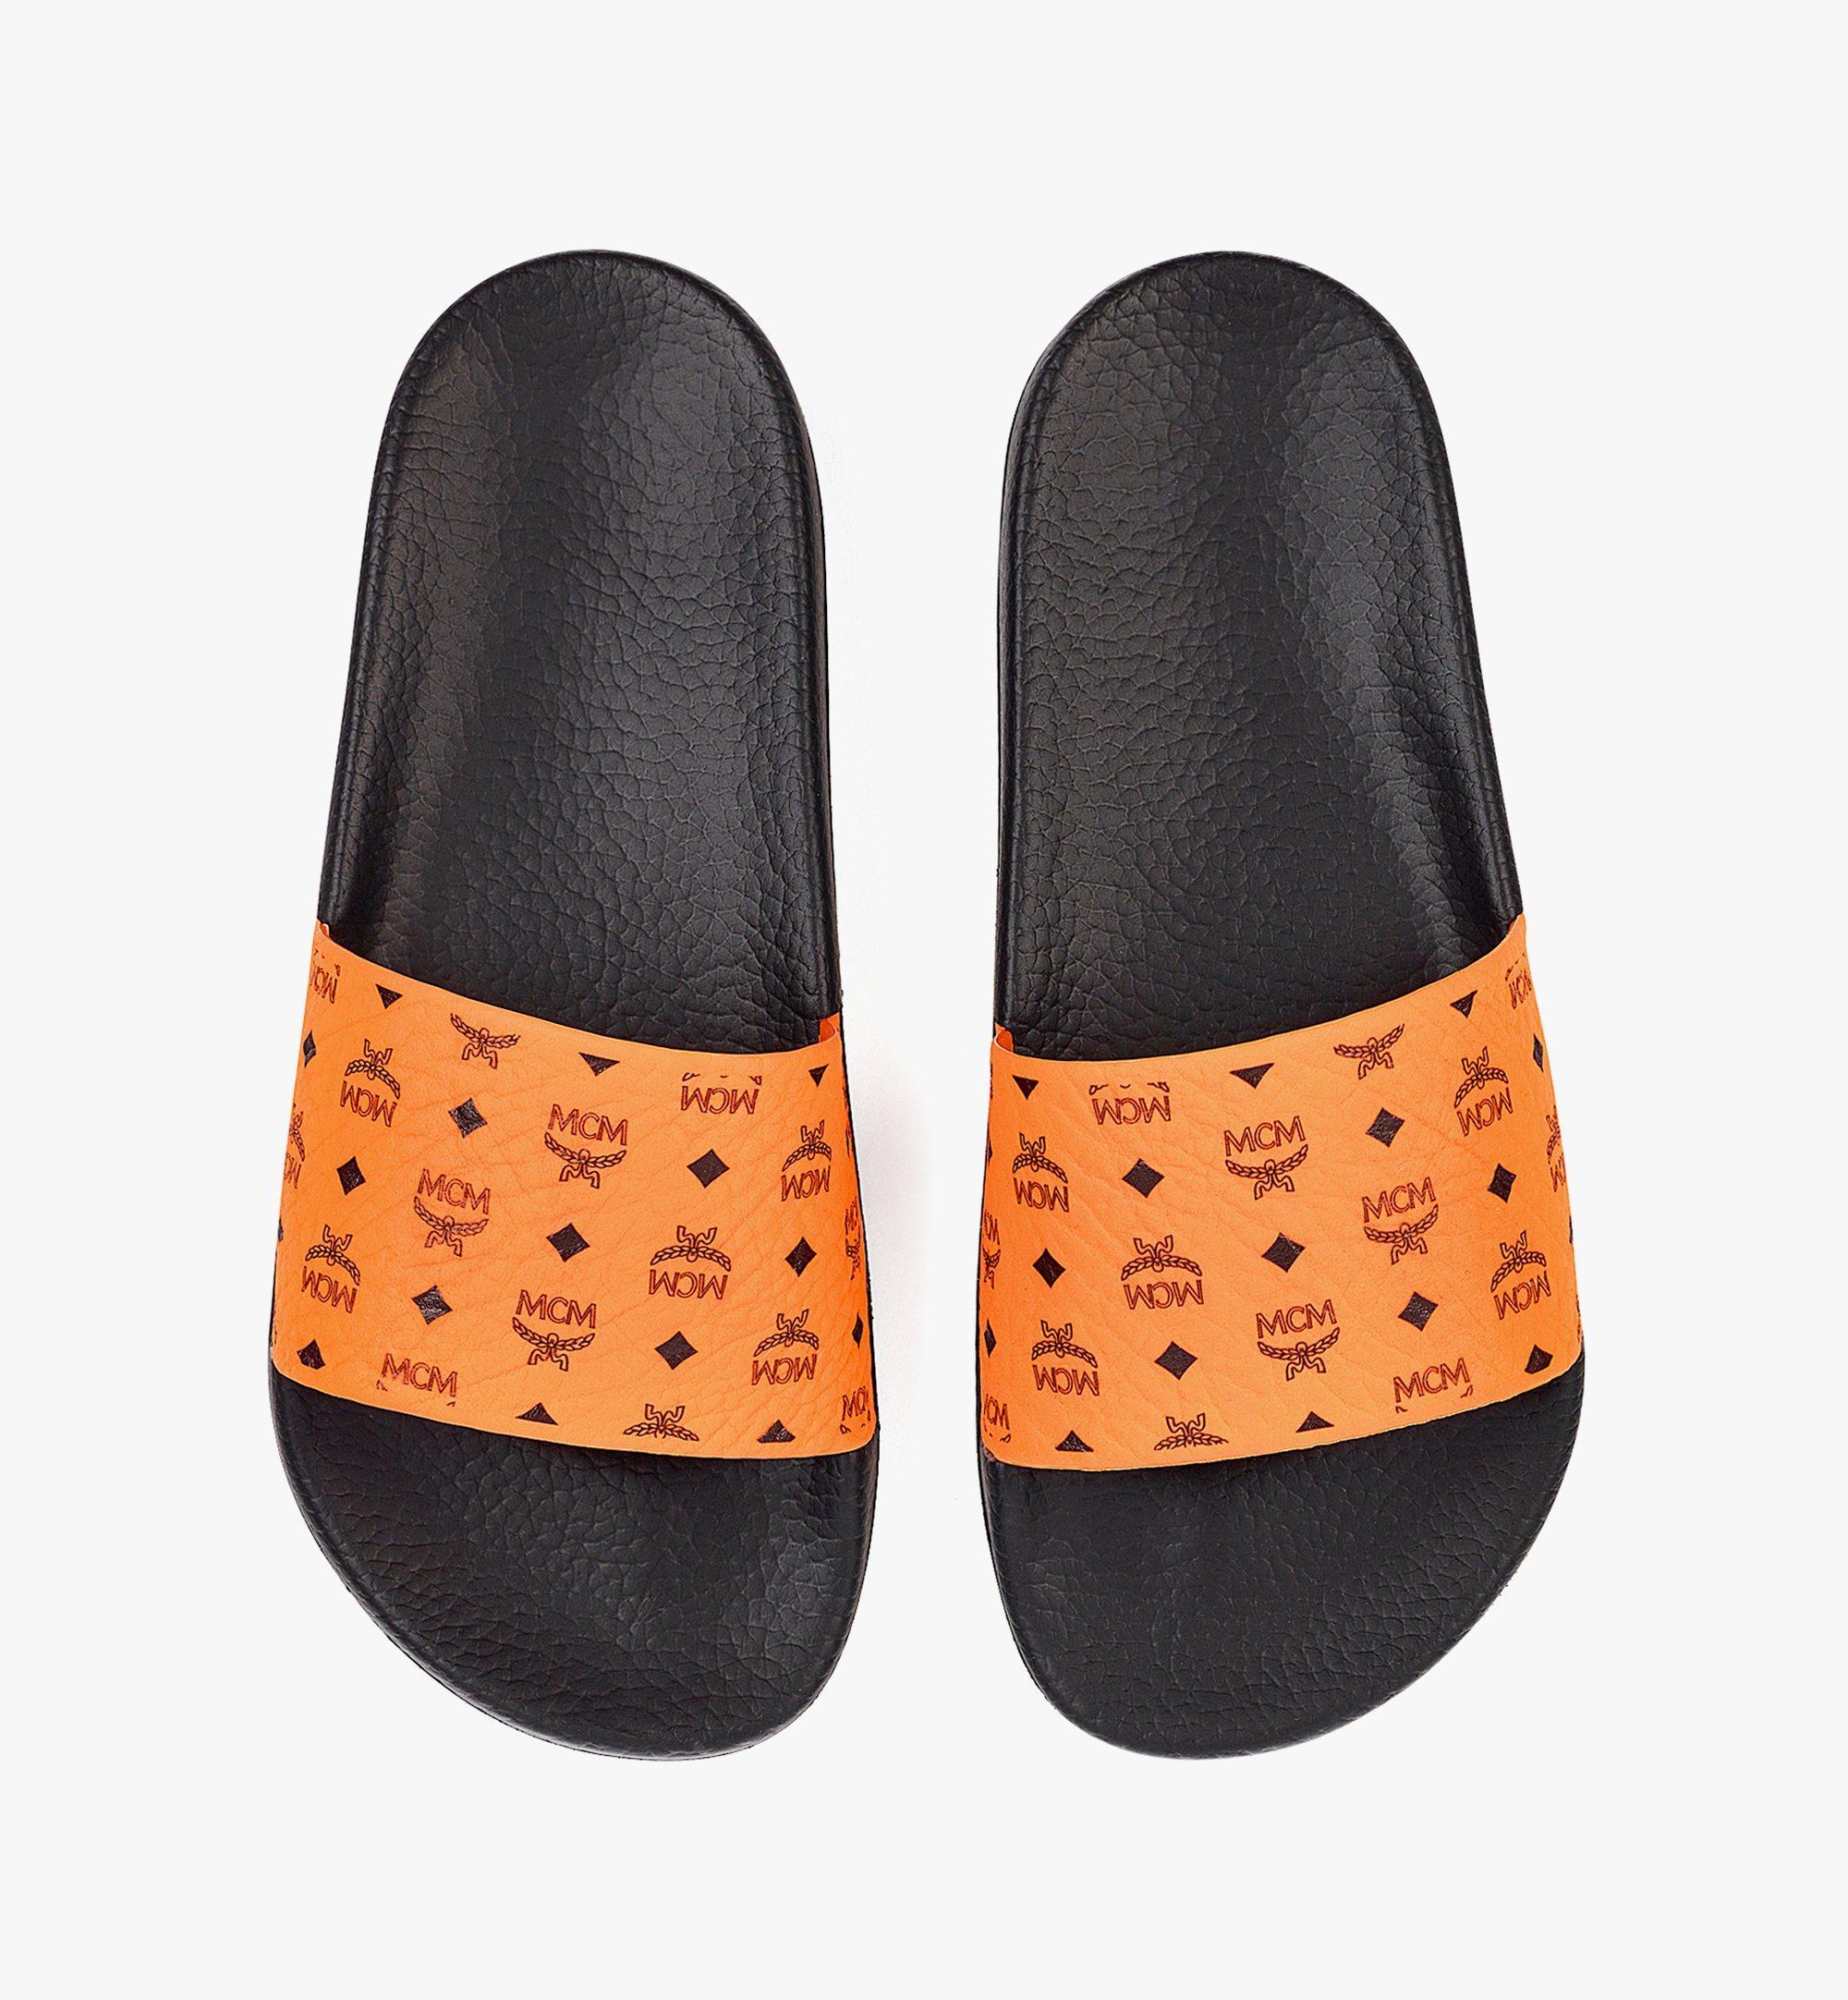 MCM 남성용 비세토스 러버 슬라이드 Orange MEX8AMM60O9041 다른 각도 보기 5